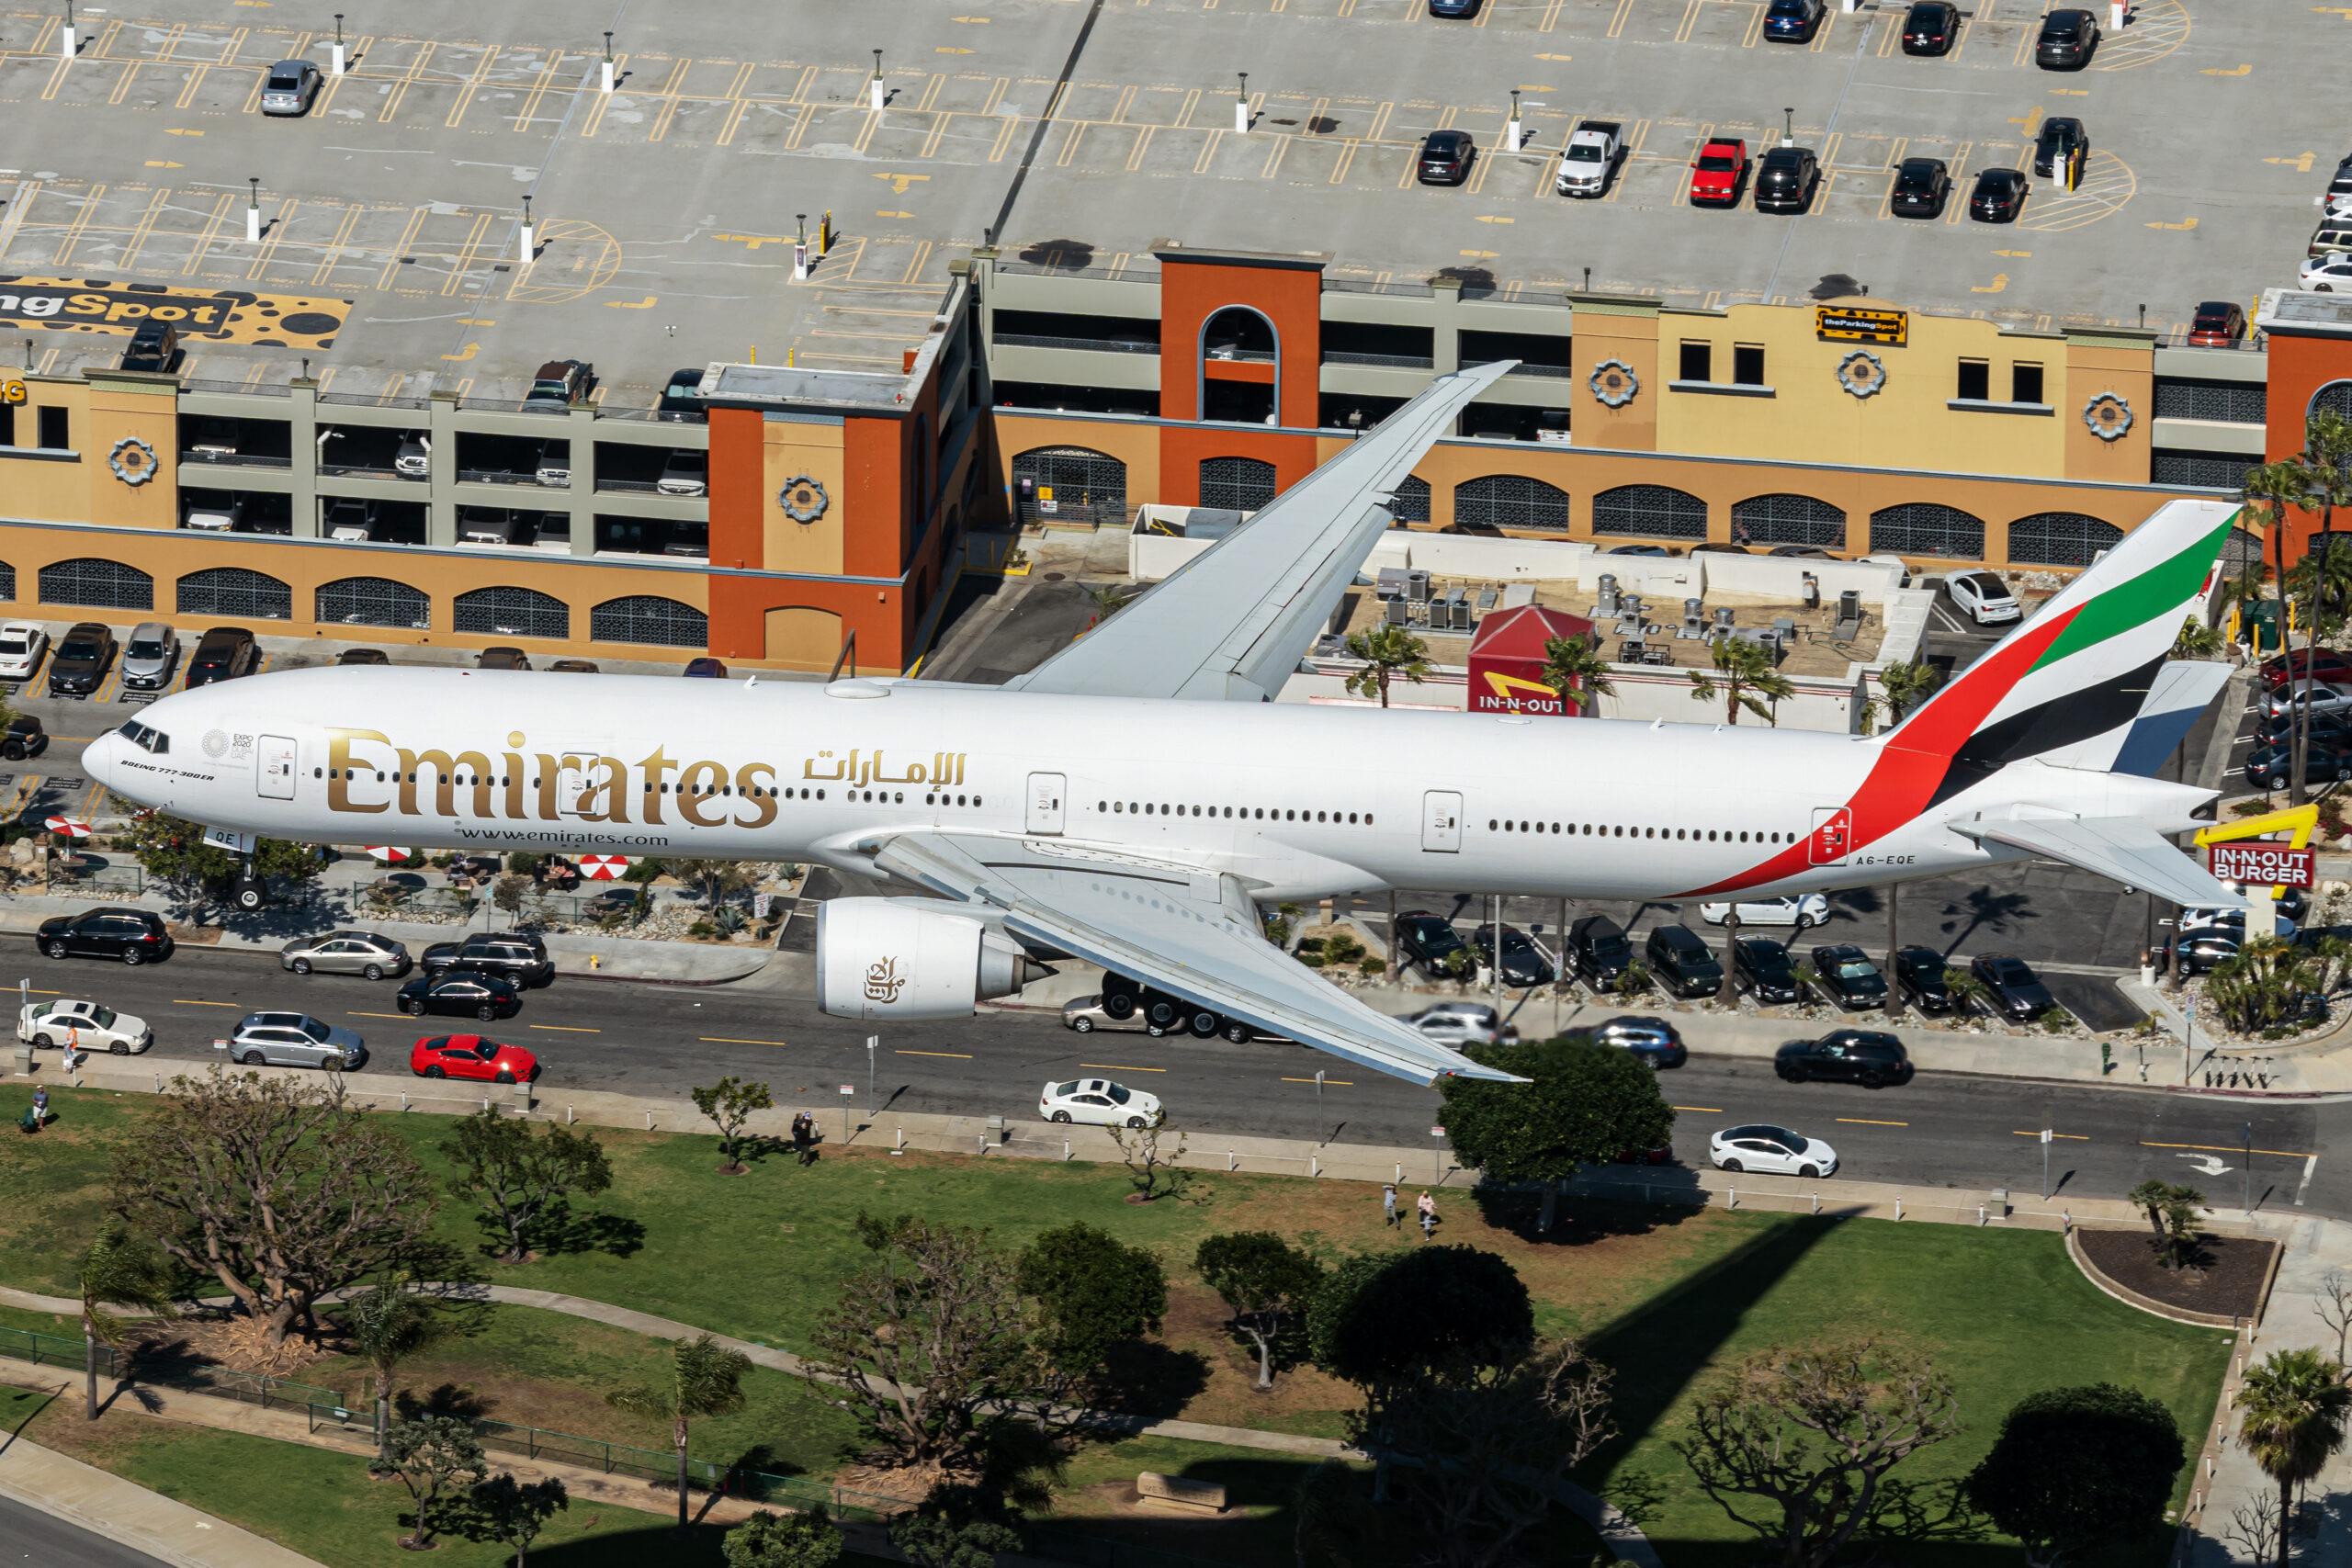 Emirates Boeing 777 landing in Los Angeles